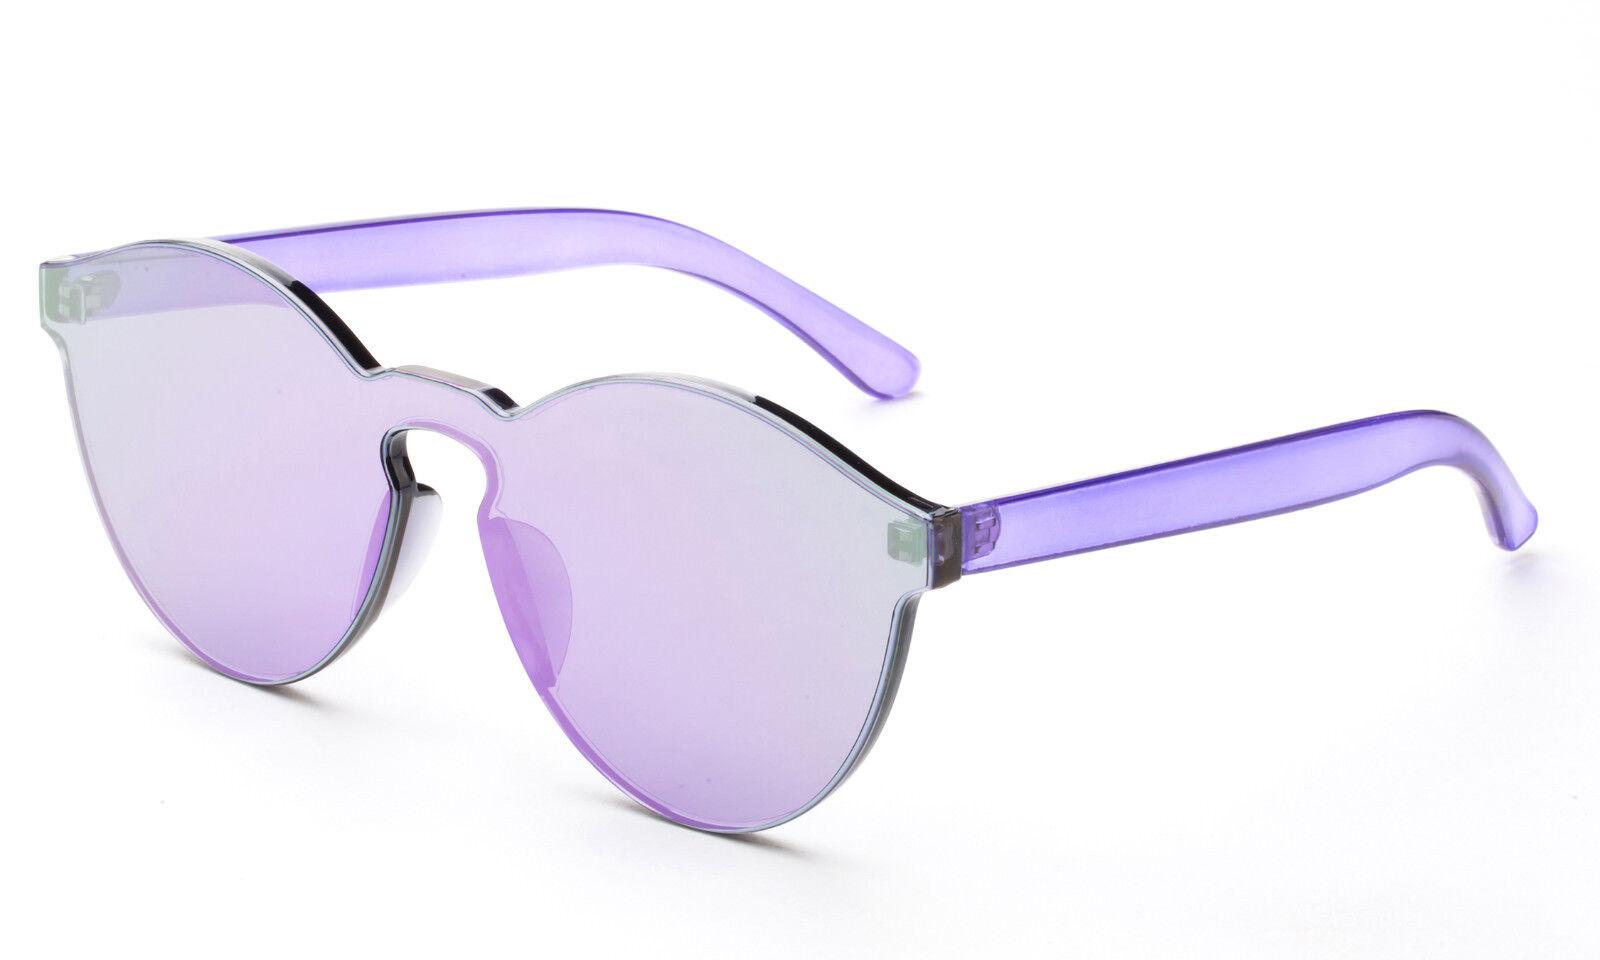 Cat Eye Sunglasses Transparent Eyewear Candy Sun Shades Luxury Purple UV 100%